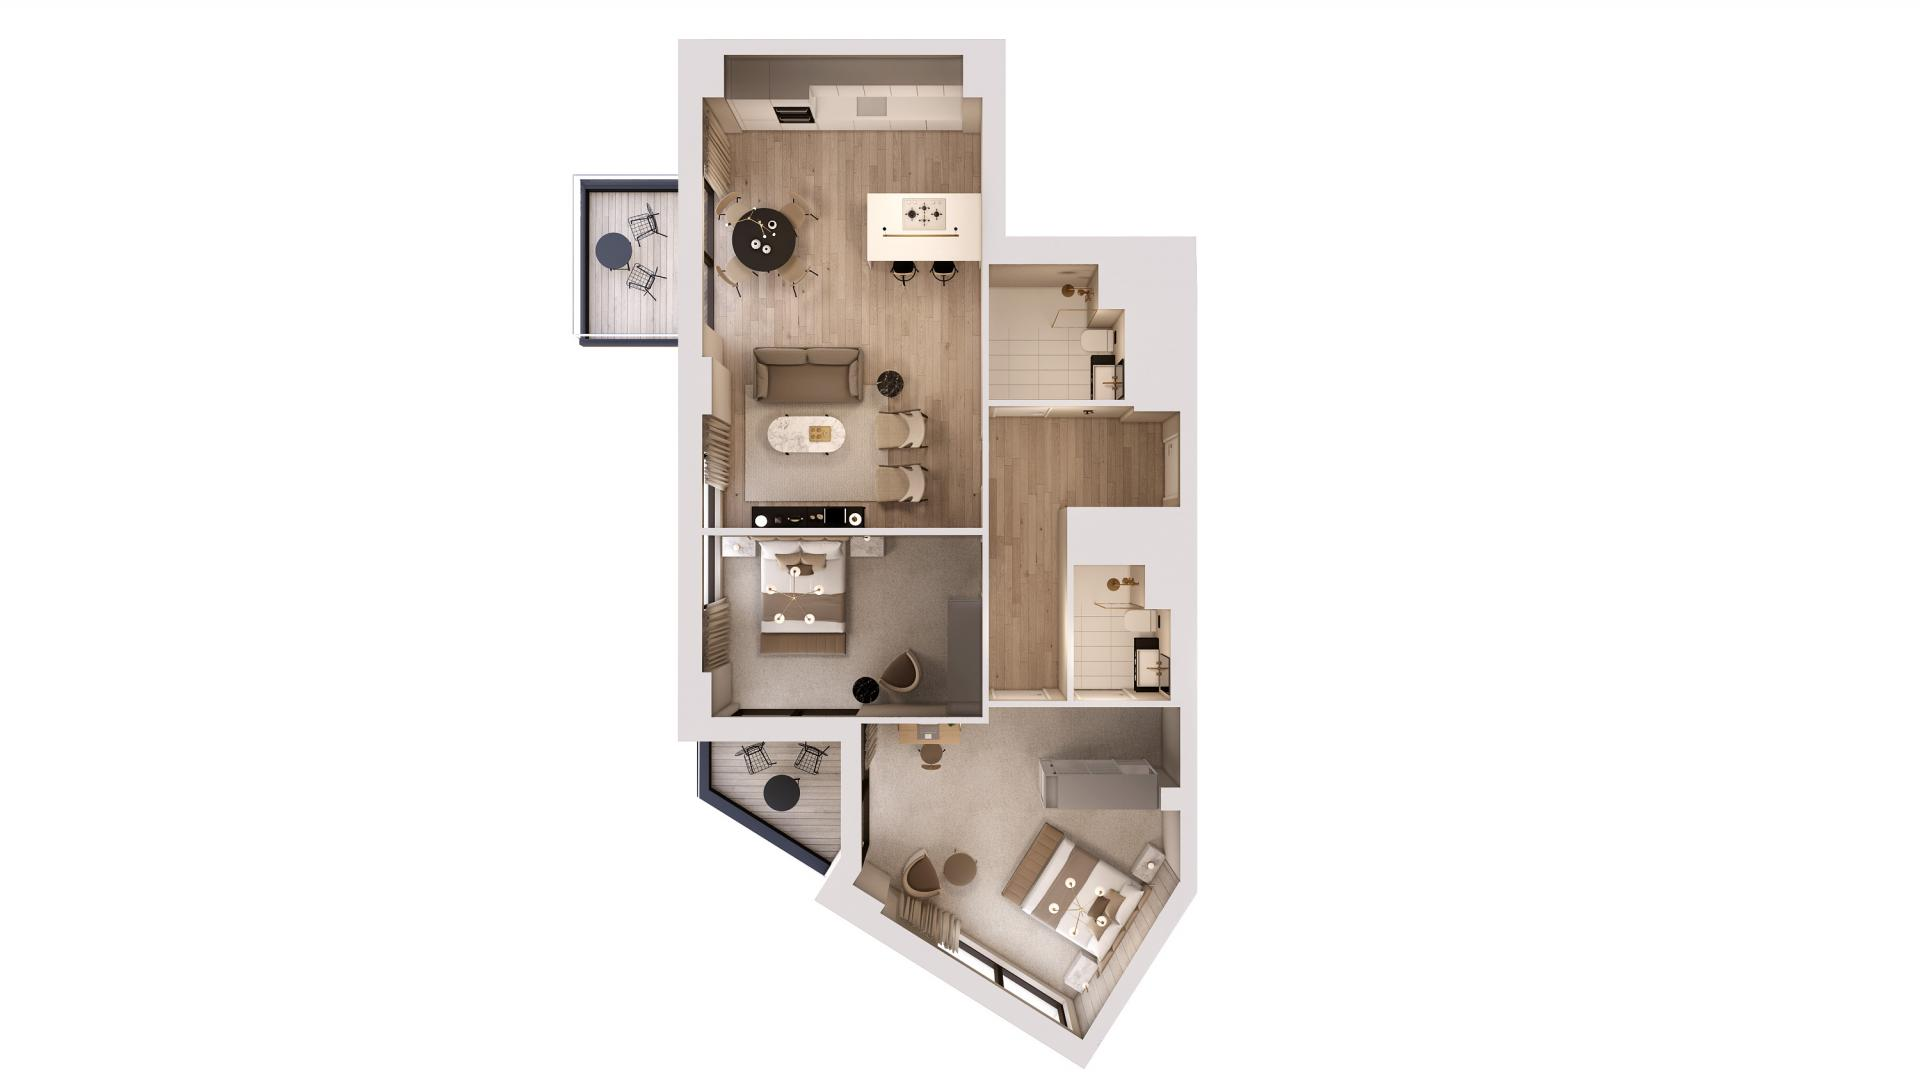 2 bed 2 bathroom floor plan at STAY Camden Serviced Apartments, Camden, London